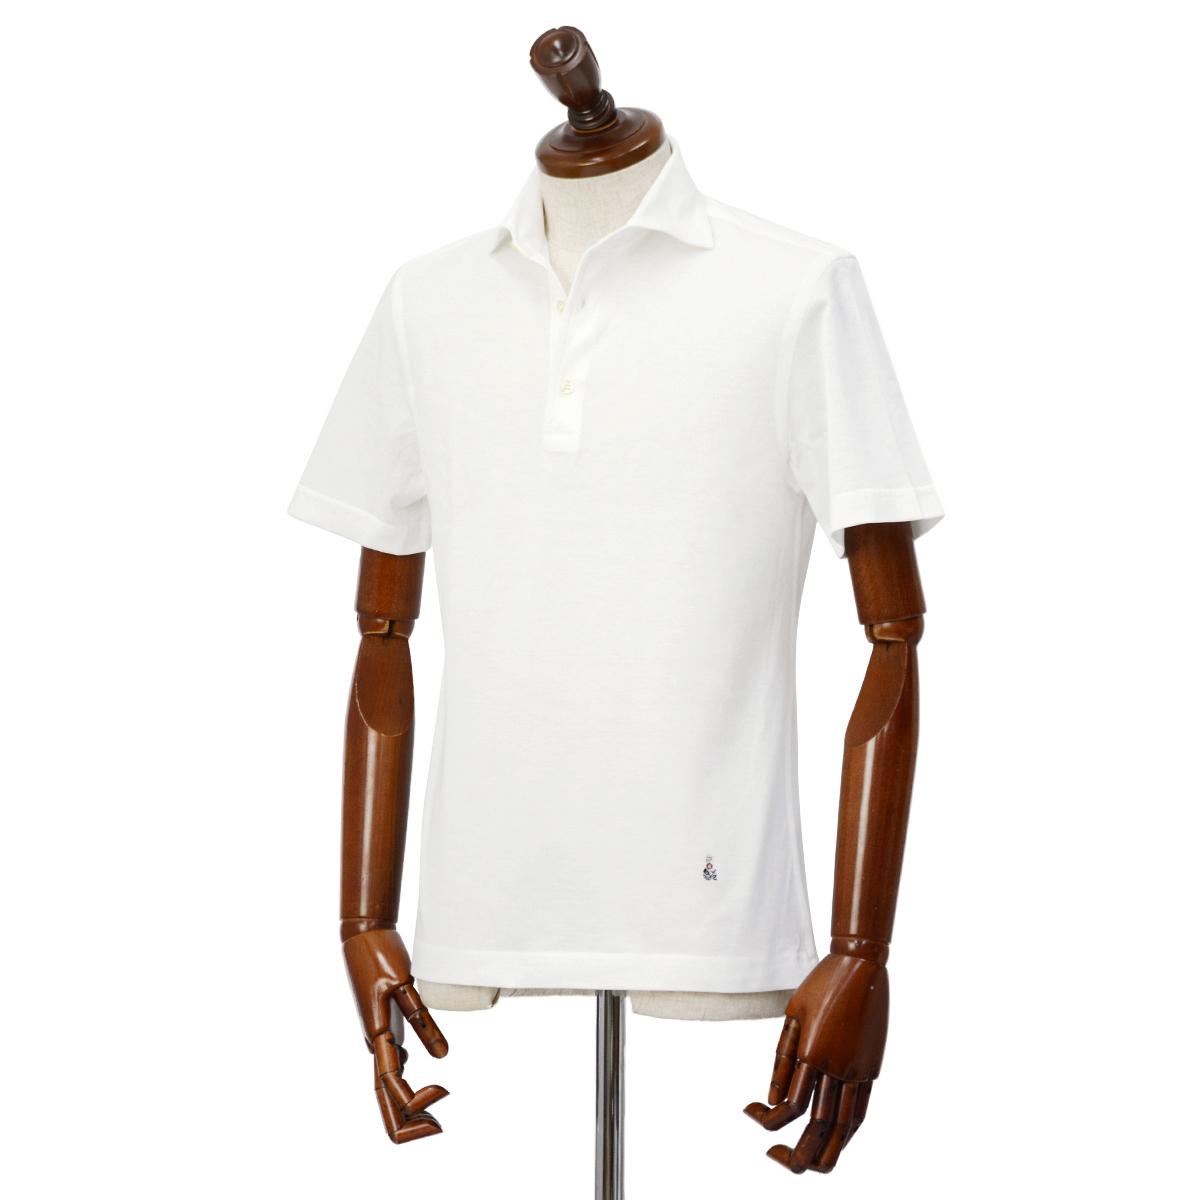 GUY ROVER【ギローバー】 半袖ポロシャツ PC435J 591503 01 鹿の子 ホリゾンタル ホワイト